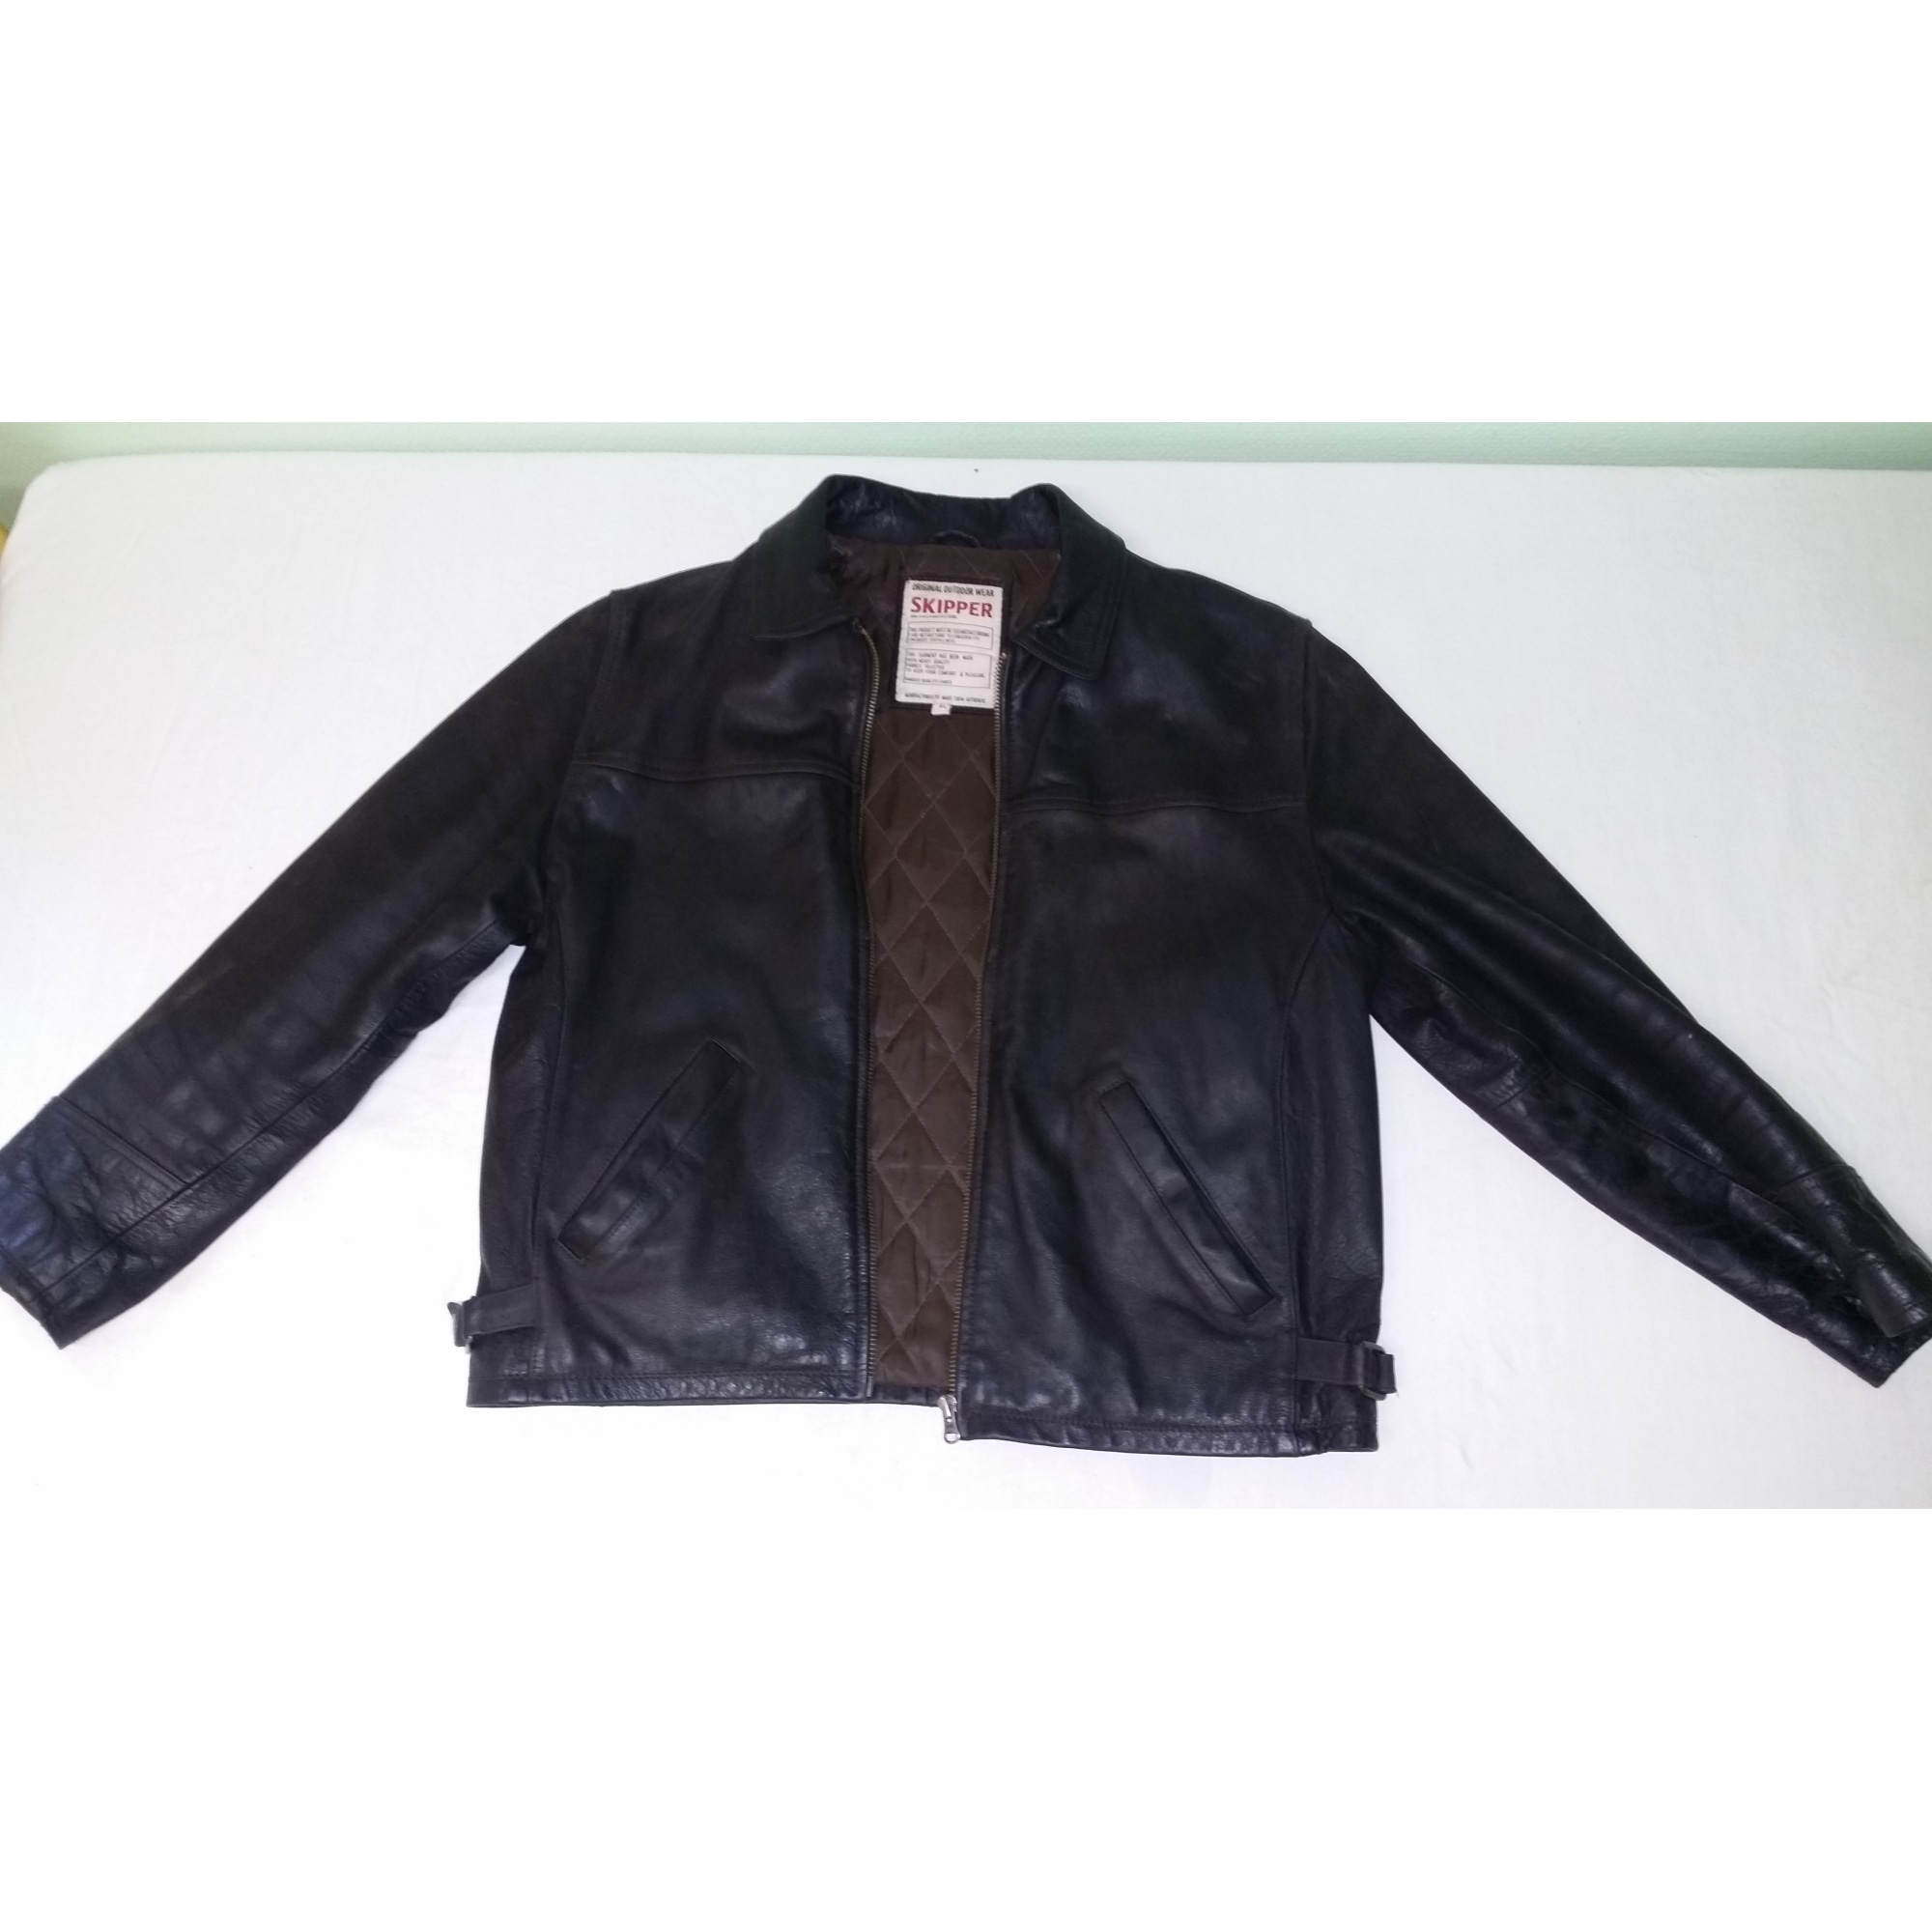 Blouson en cuir SKIPPER 52 (L) marron 6724578